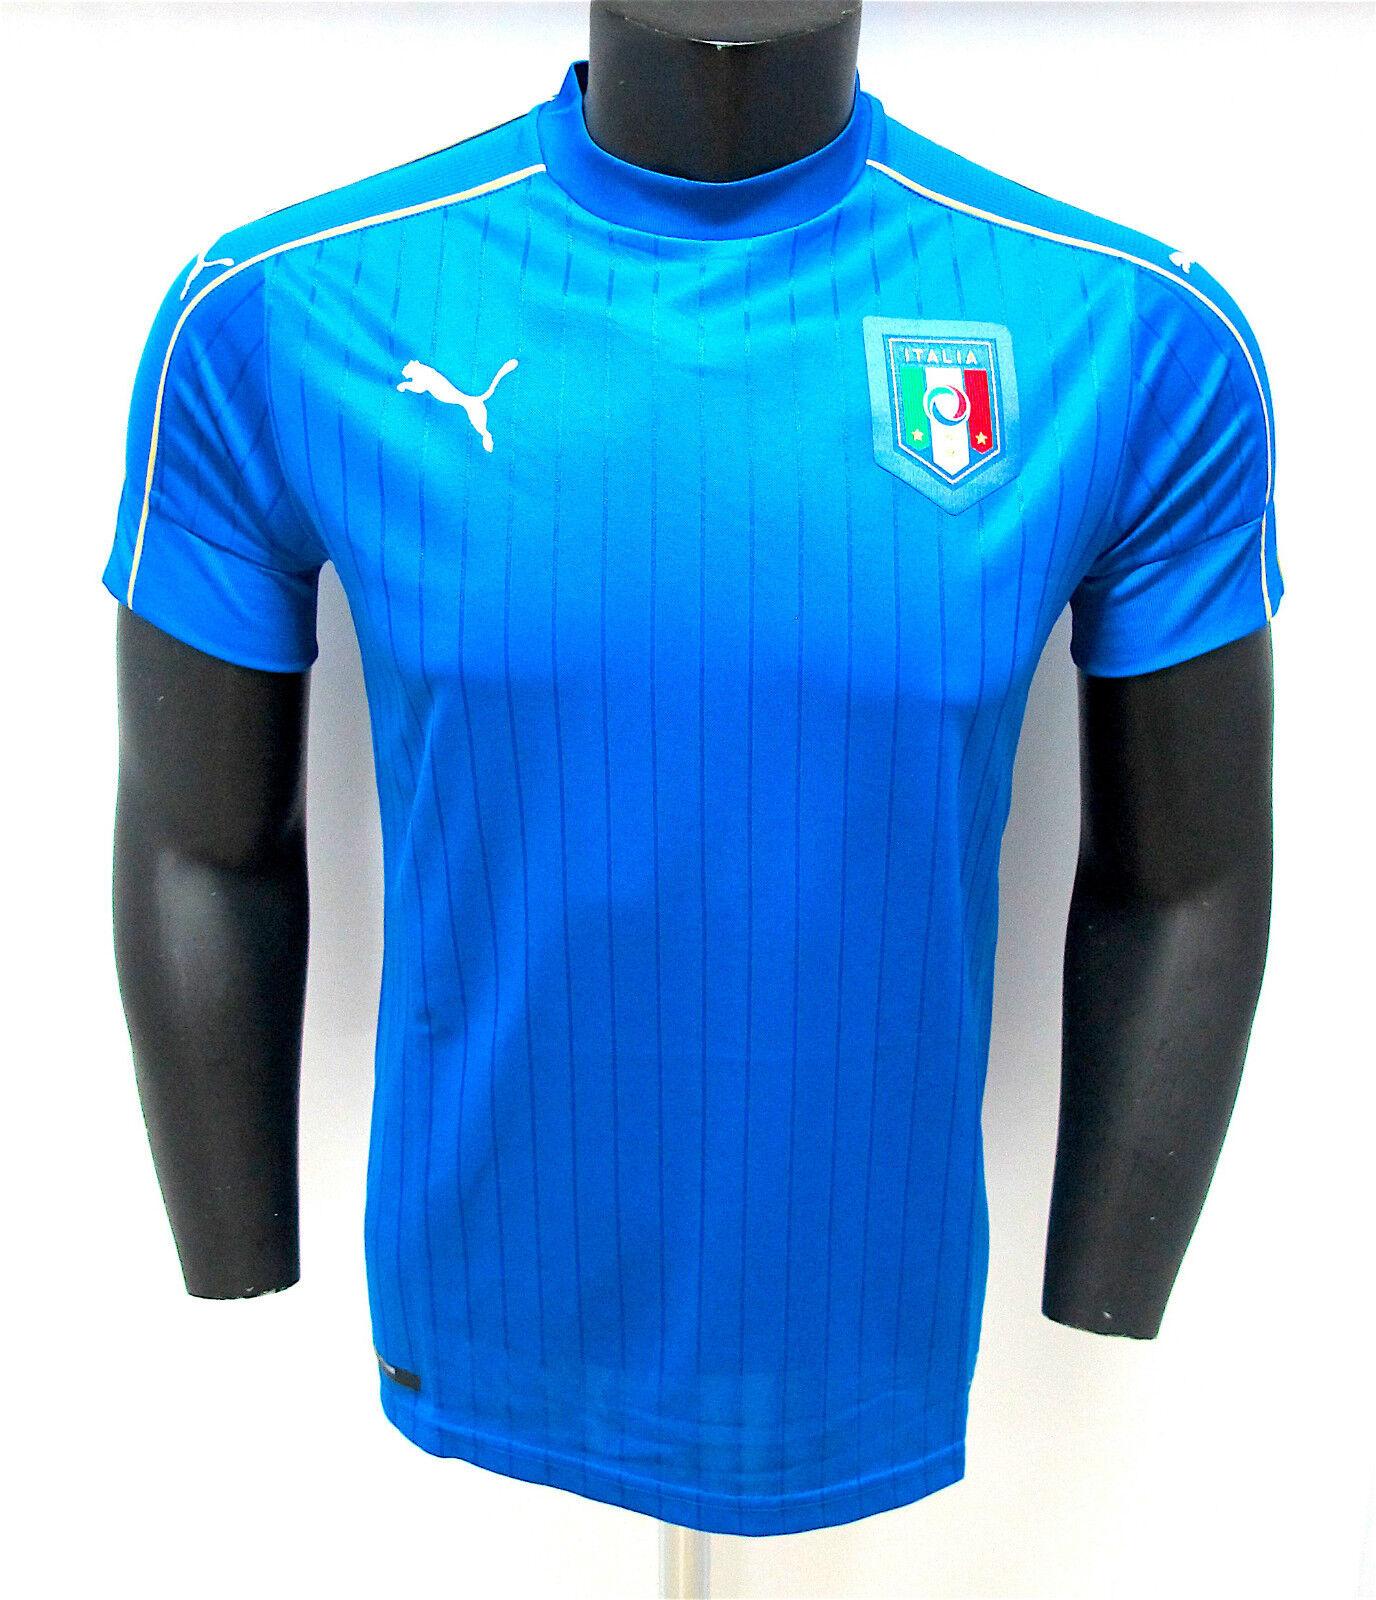 PUMA prima offizielles Trikot Trikot Trikot Baby Italien art.748833-01 Kol. Blau europäisch 16 475537